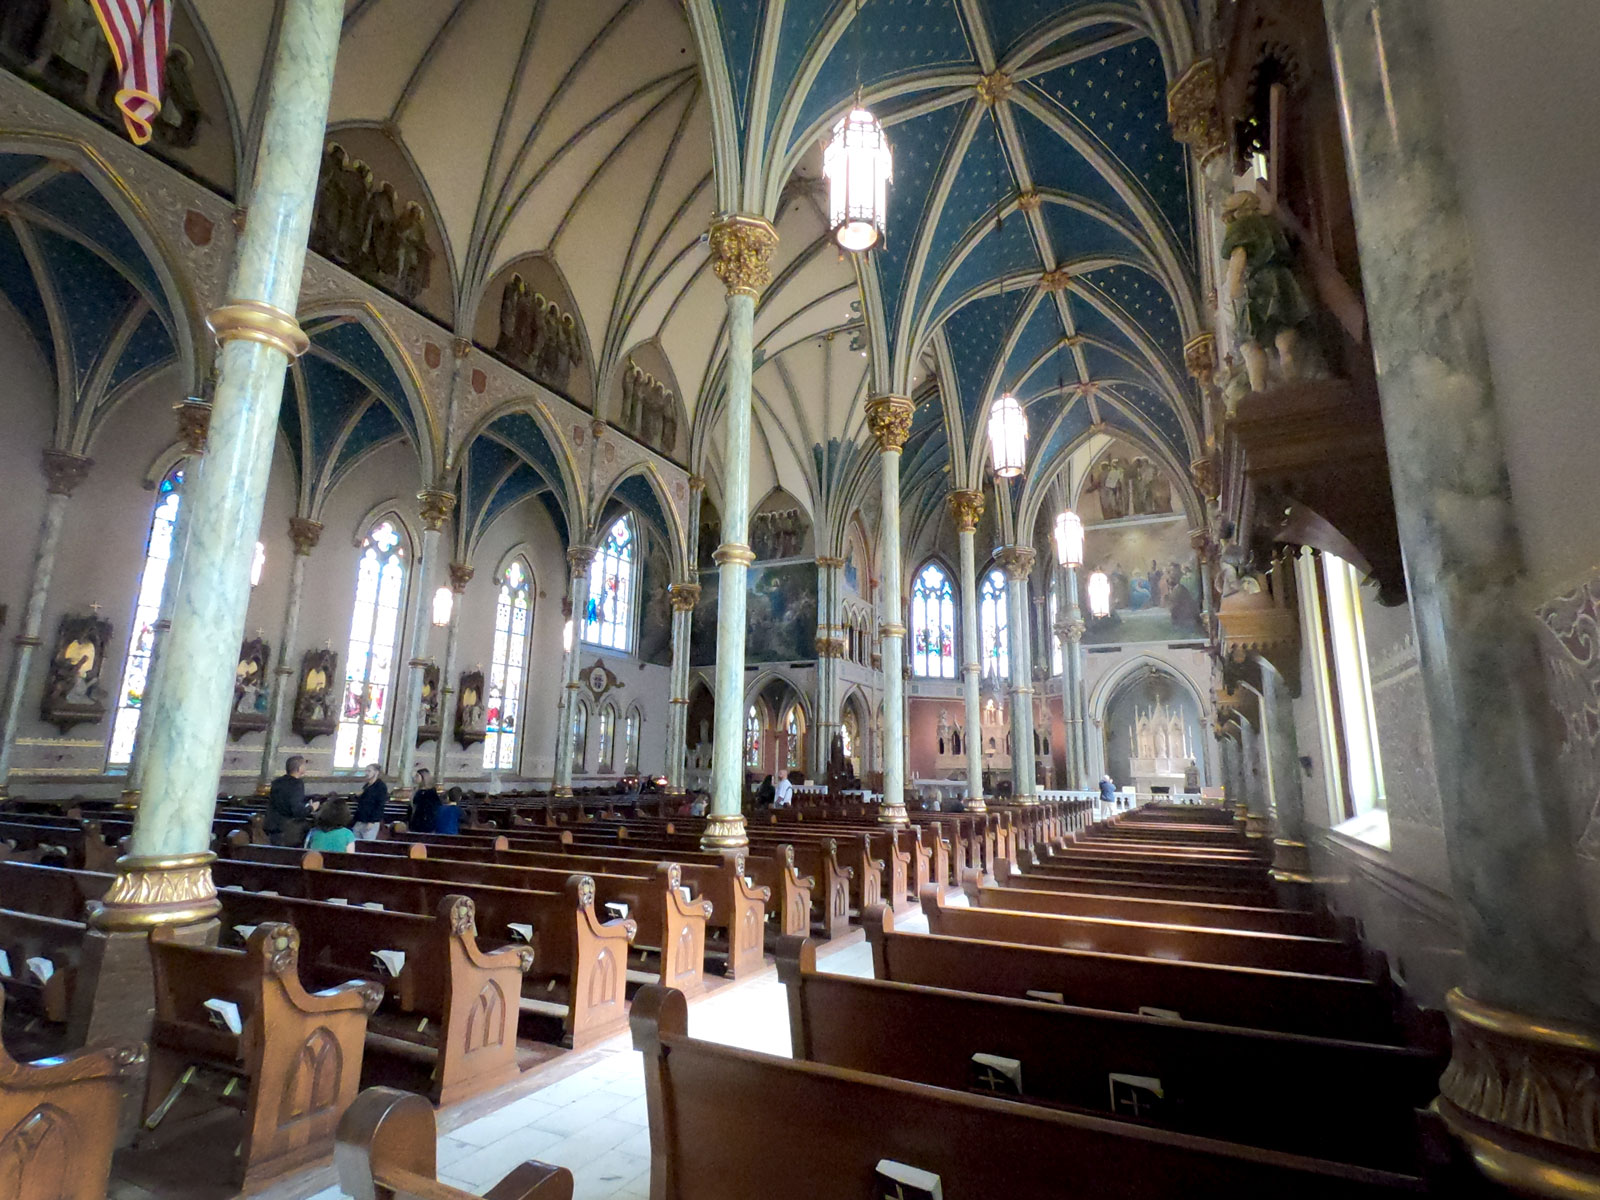 Interior of Cathedral of St John the Baptist Catholic Church in Savannah, Georgia